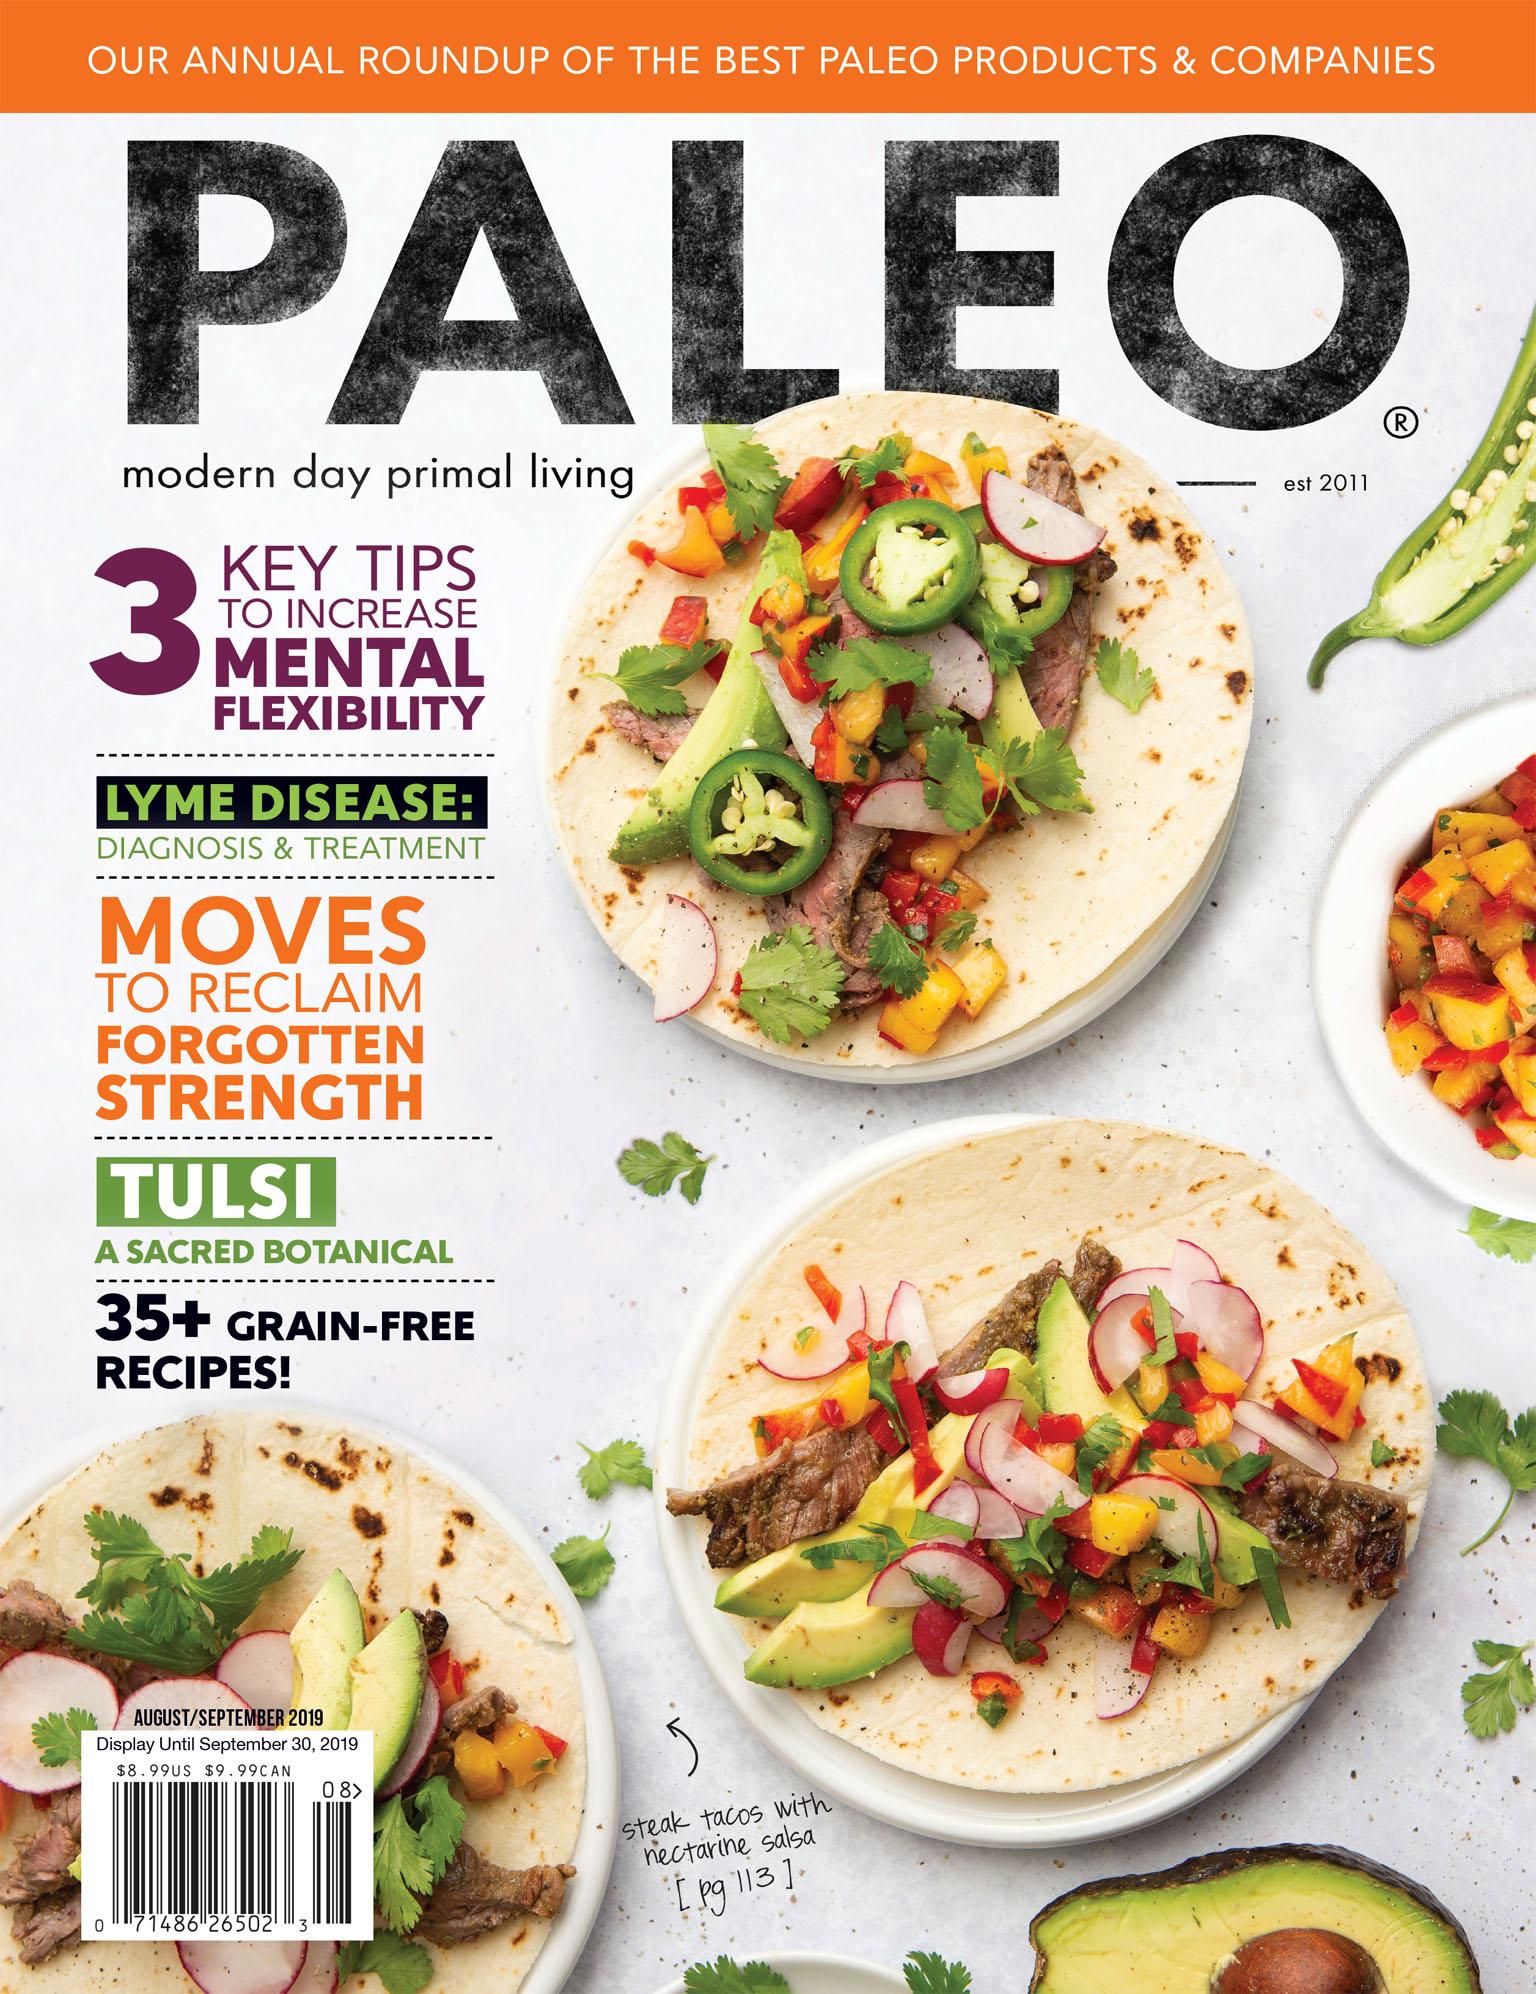 Cover photo for Paleo Magazine - Steak Taco Food Photography